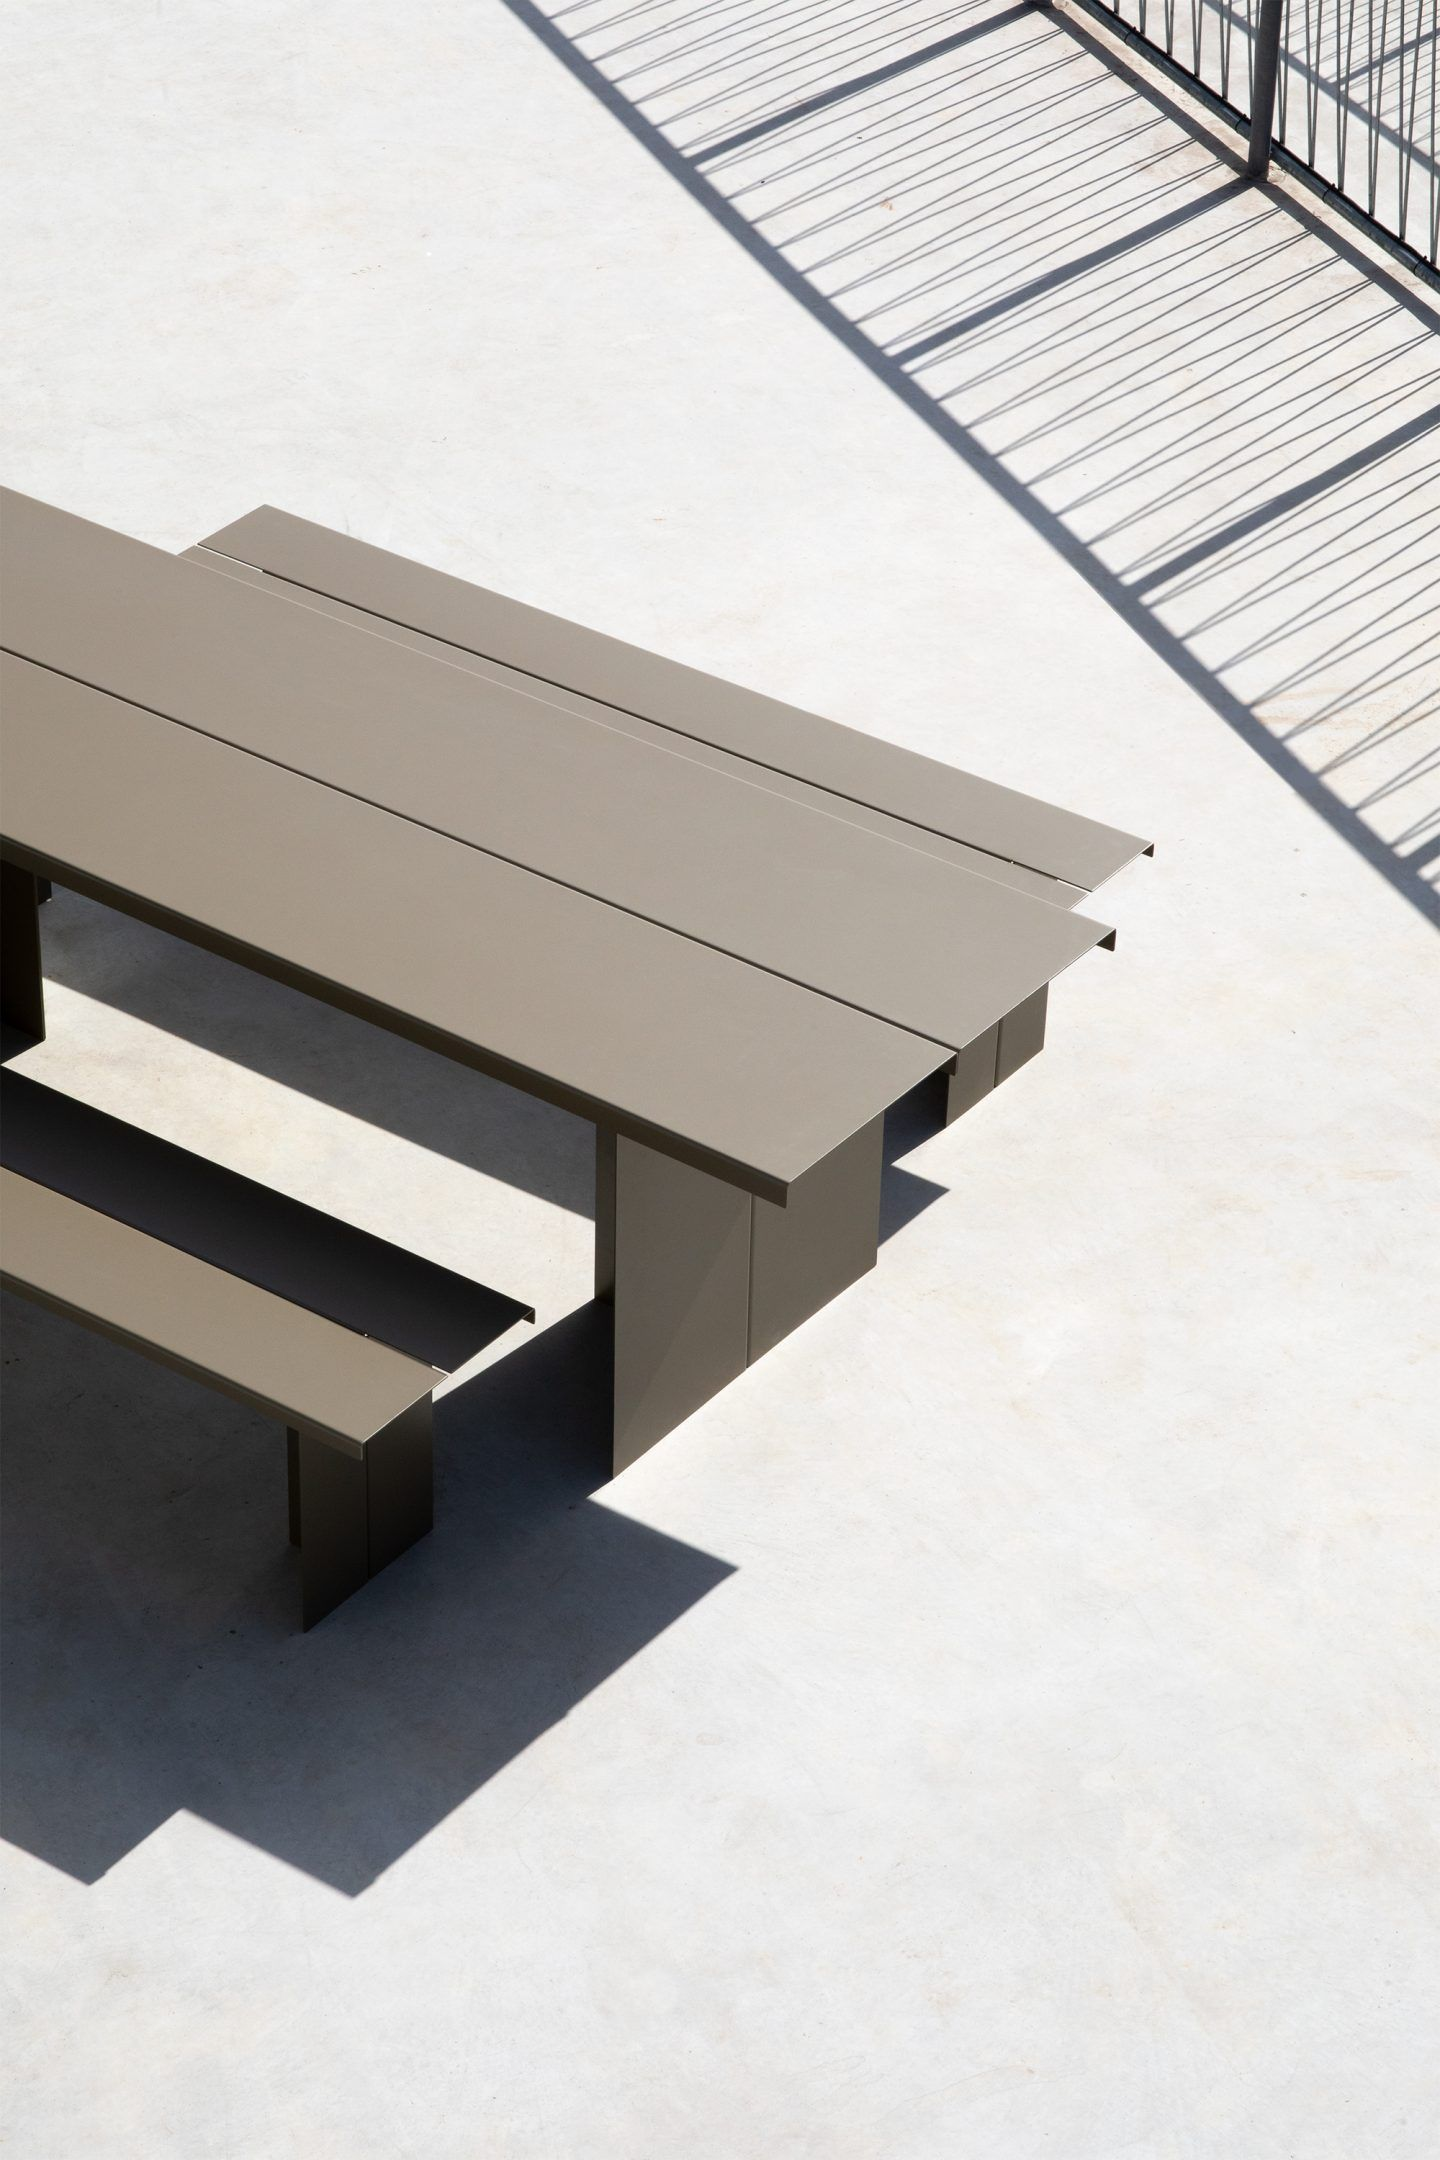 IGNANT-Design-Objekte-Unserer-Tage-Zebe-Table-3